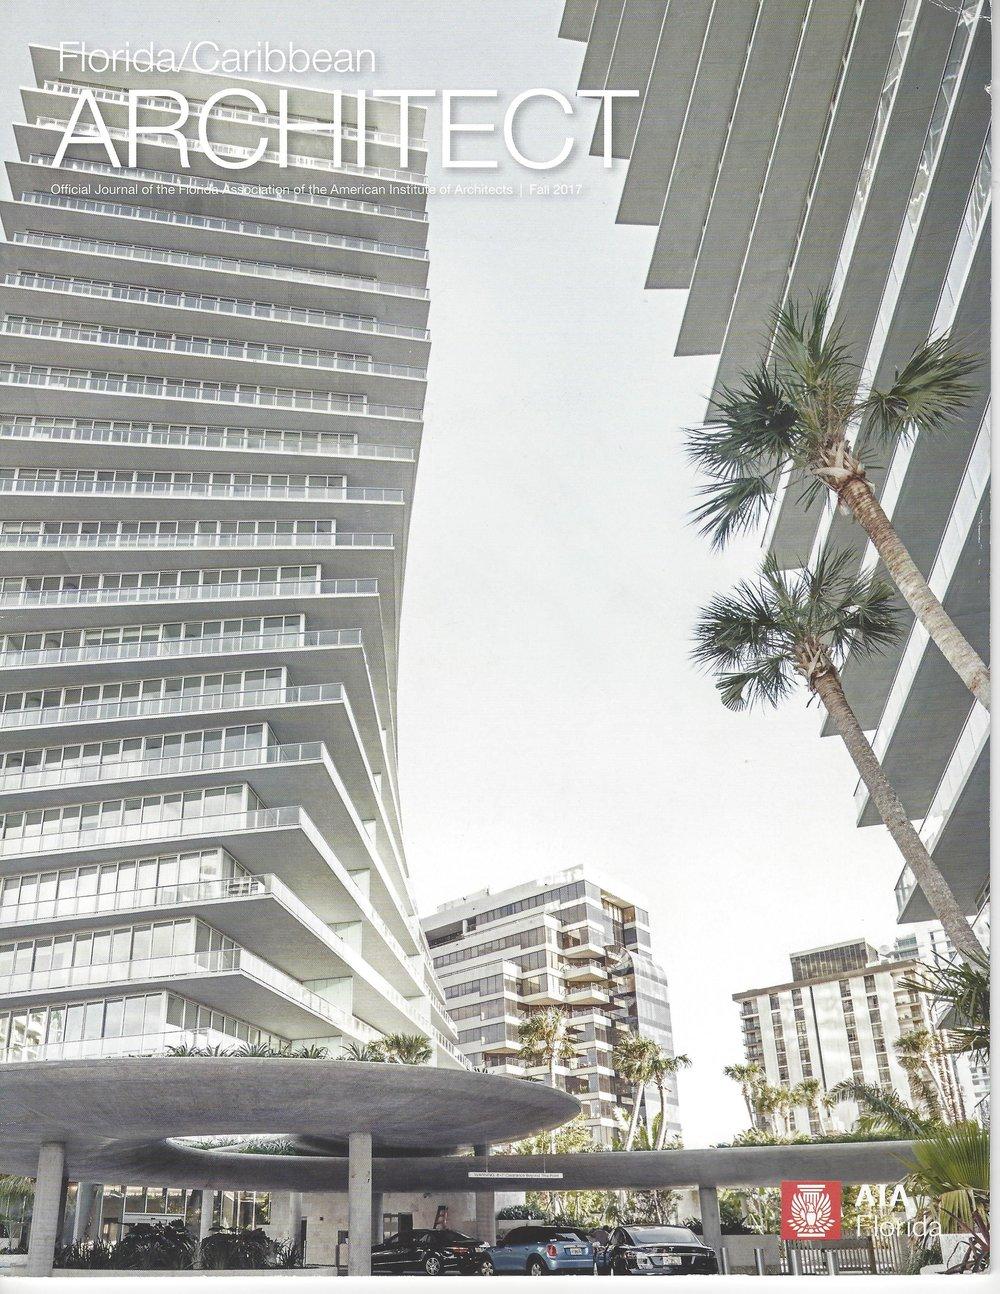 FLCaribbean Architect Cover.jpg